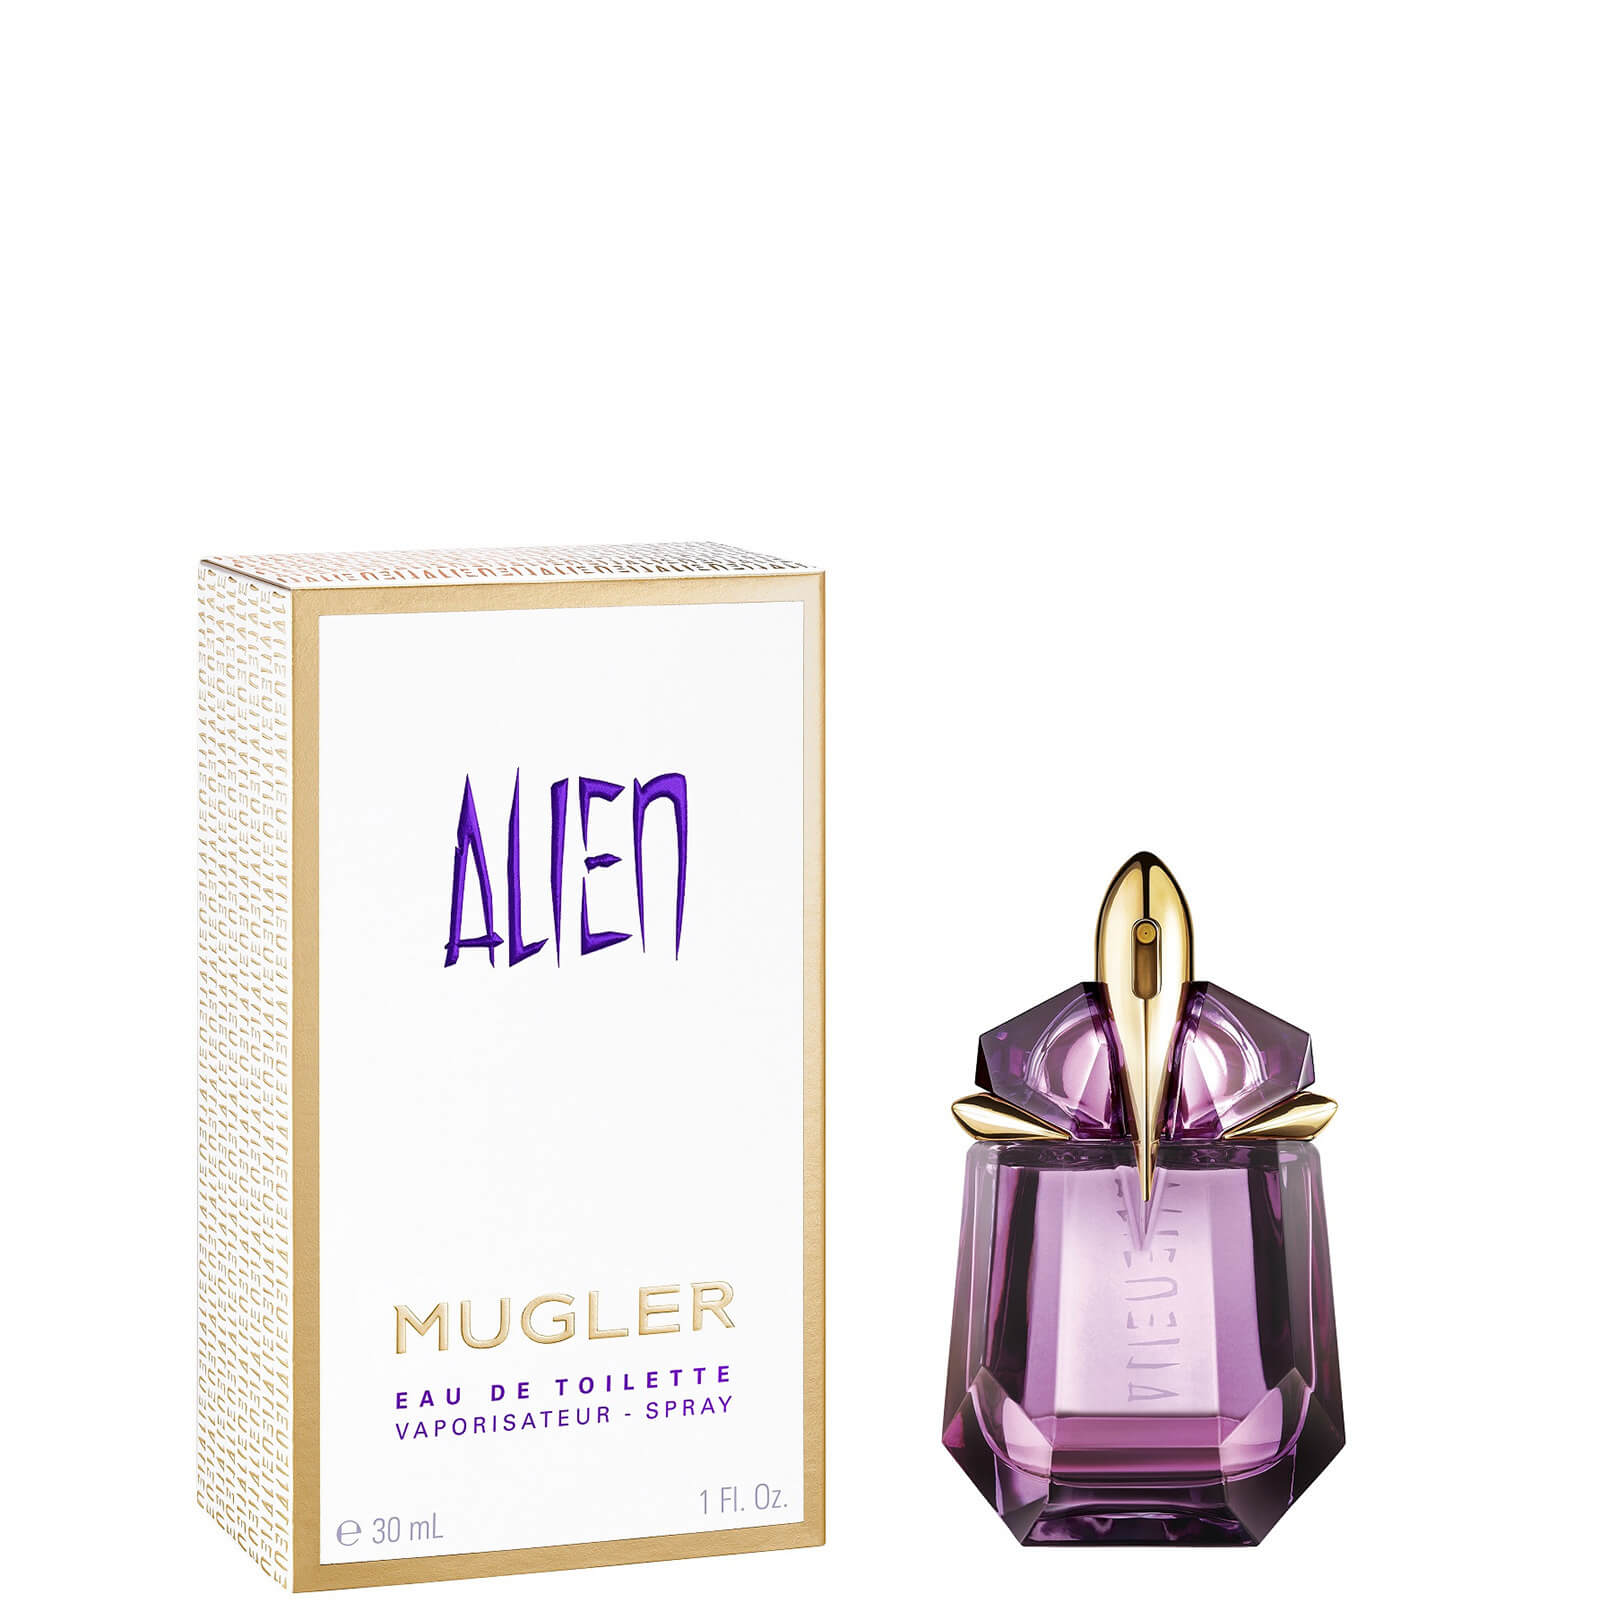 MUGLER Alien Eau de Toilette Natural Spray (Various Sizes) - 30ml